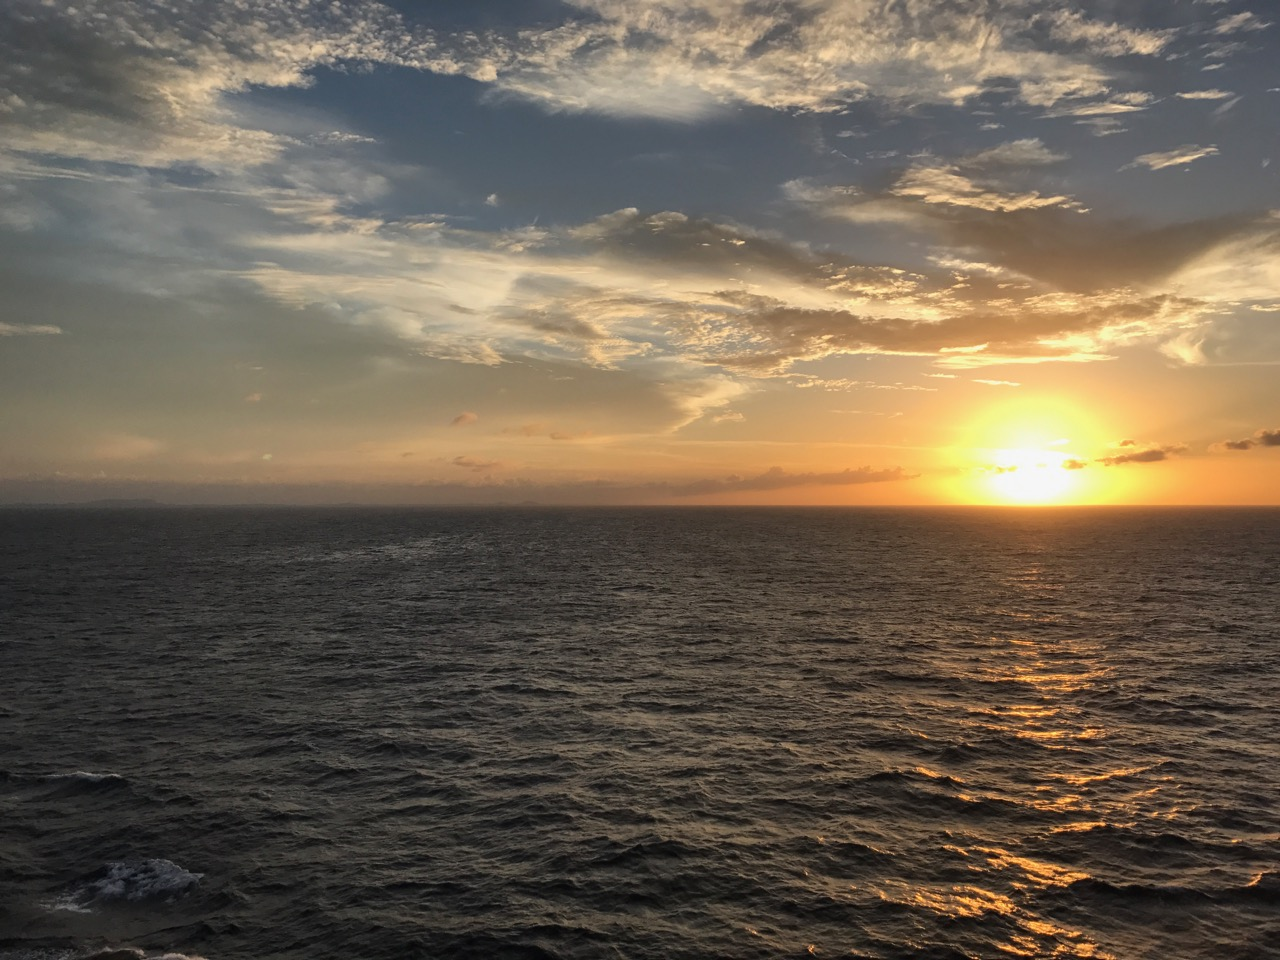 Disney Fantasy Curacao - Sunset Over Ocean